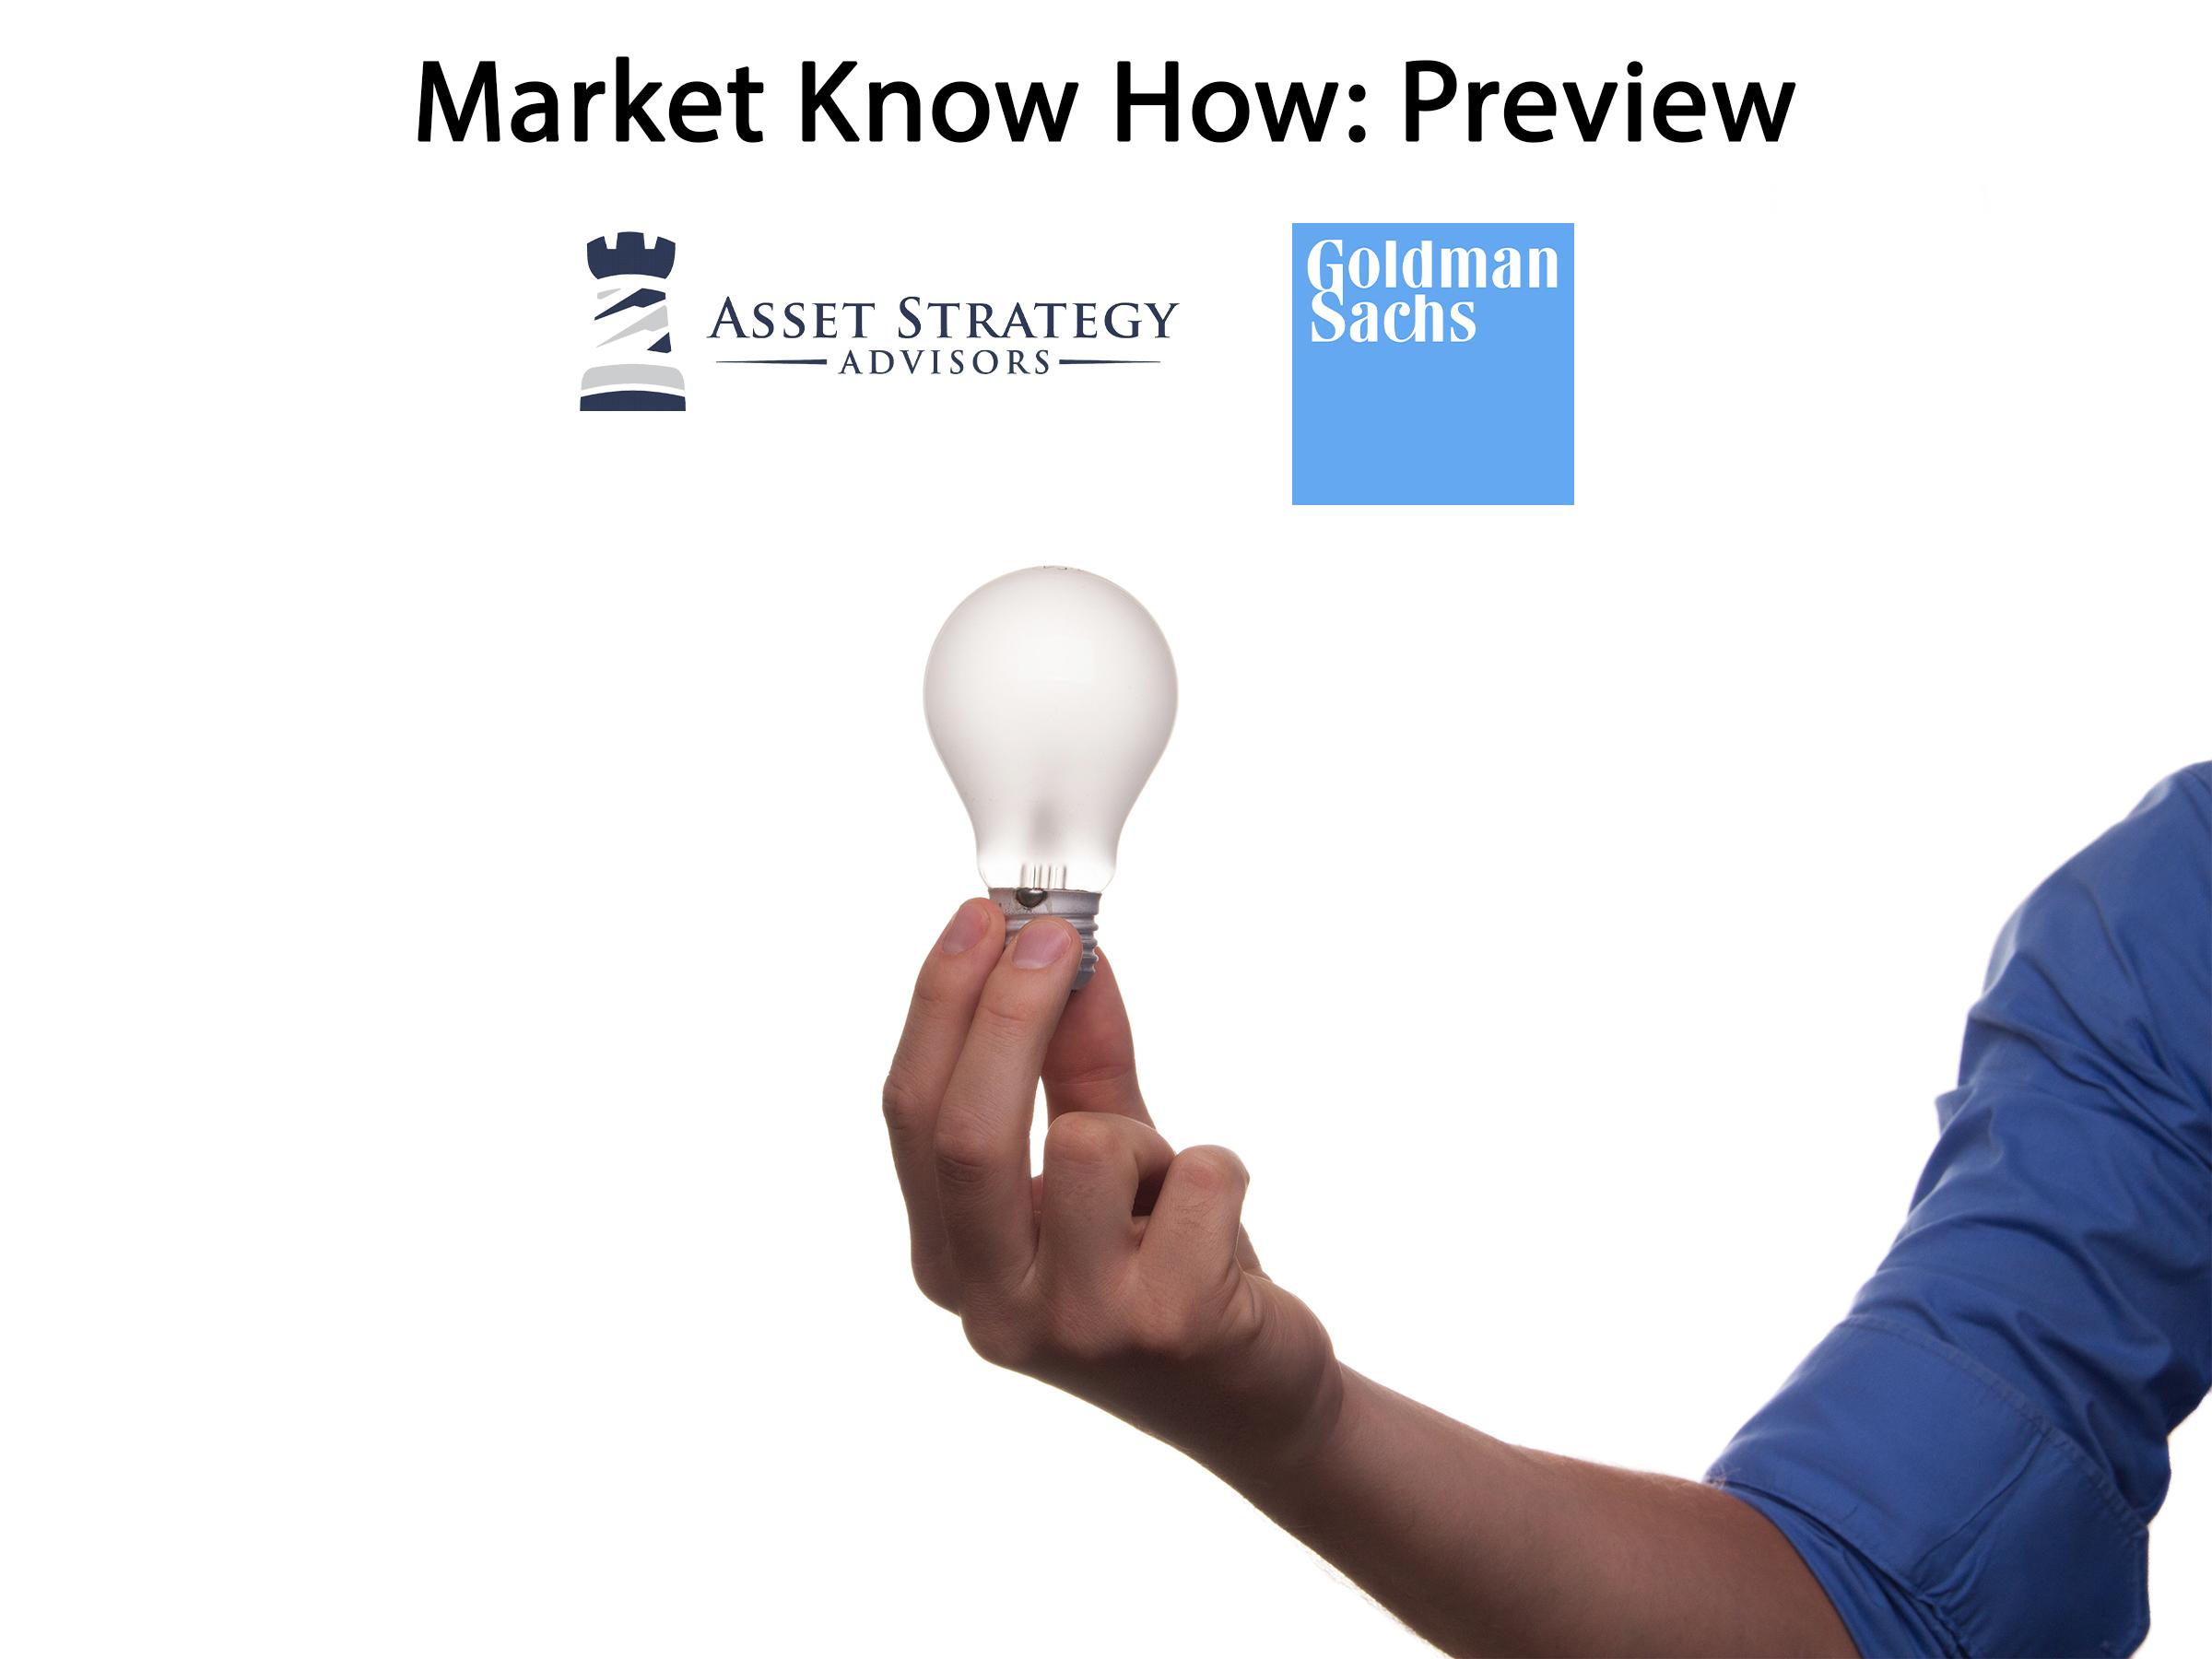 Market Know How thumbnail.jpg